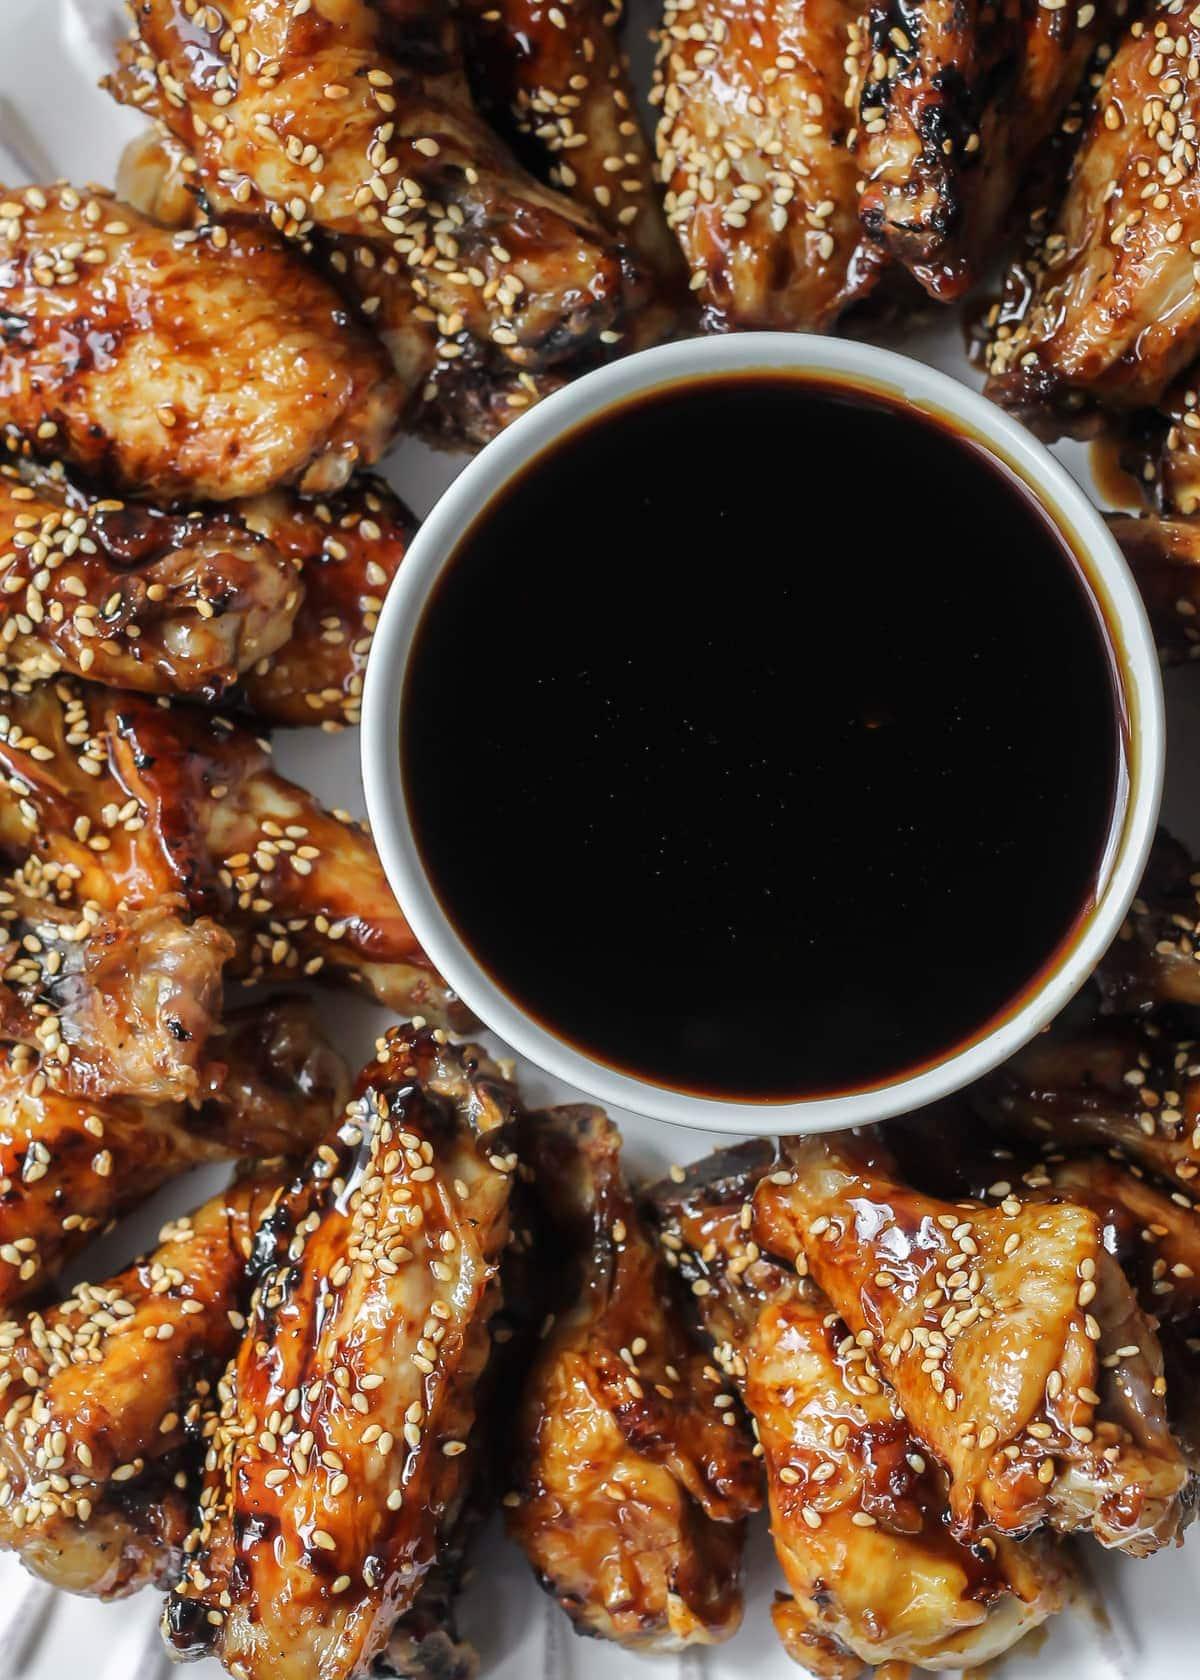 Teriyaki Wings on dish with sauce